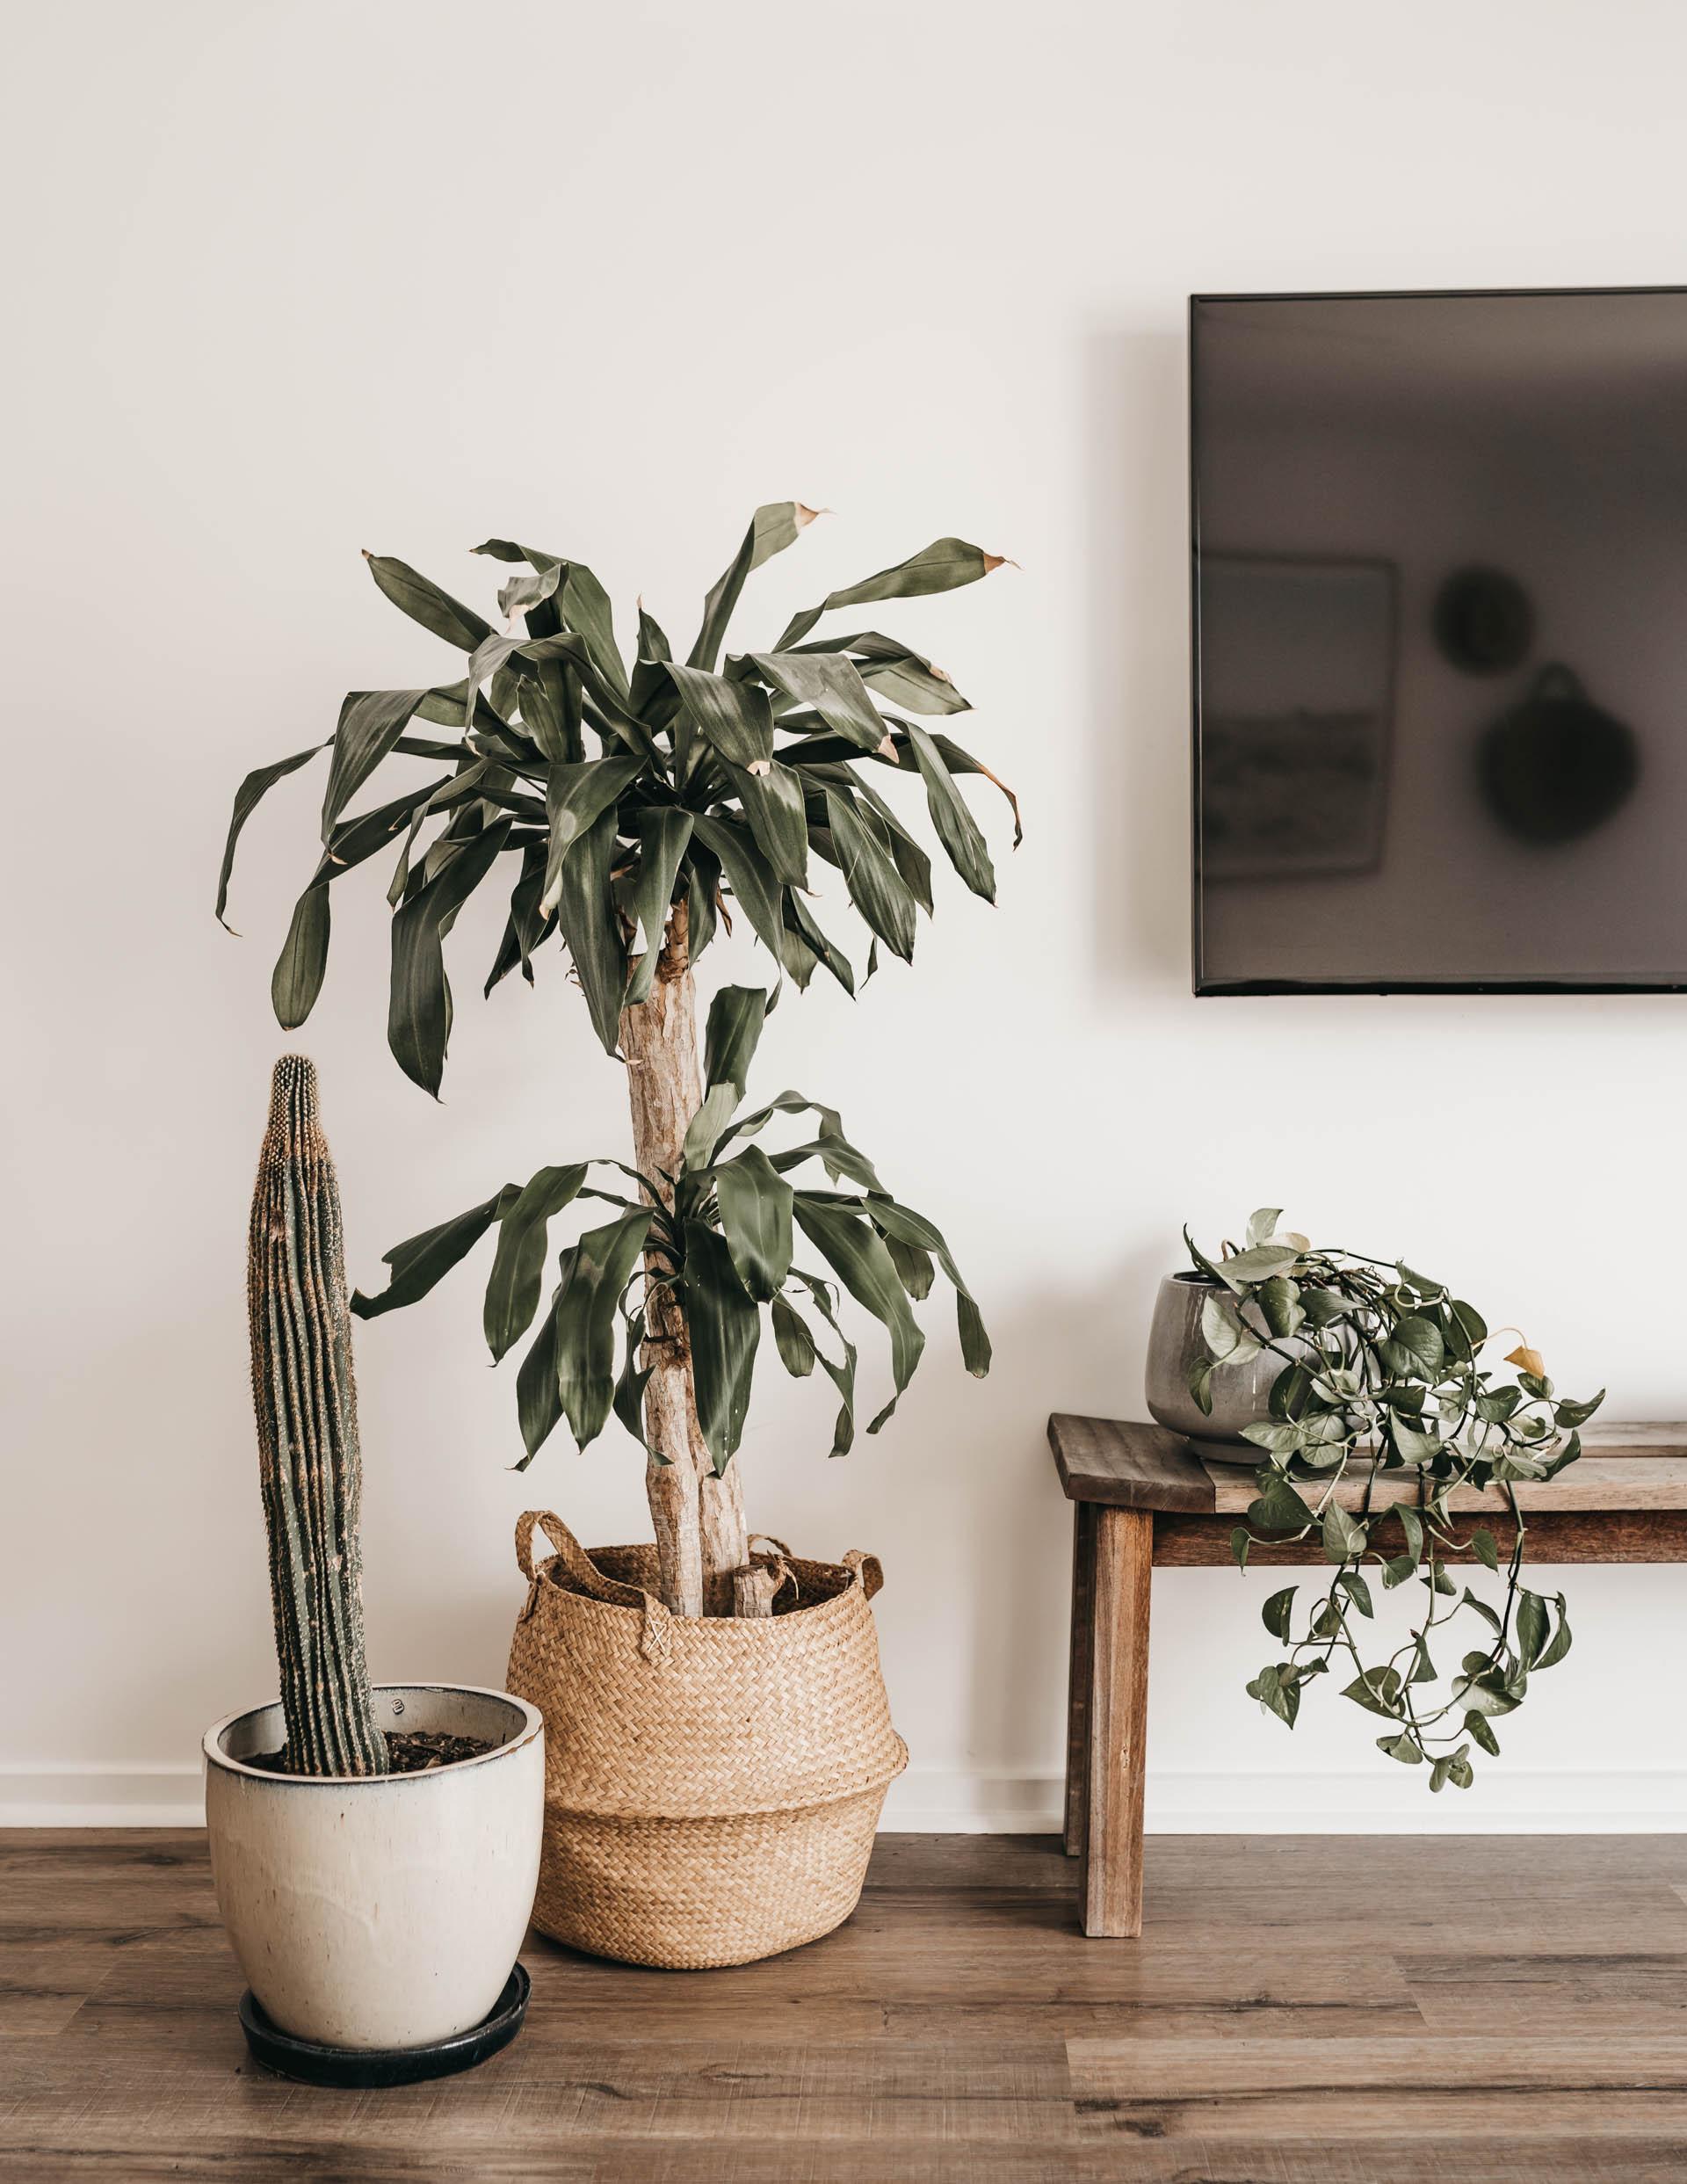 keira-mason-caba-cottage-plants-home.jpg